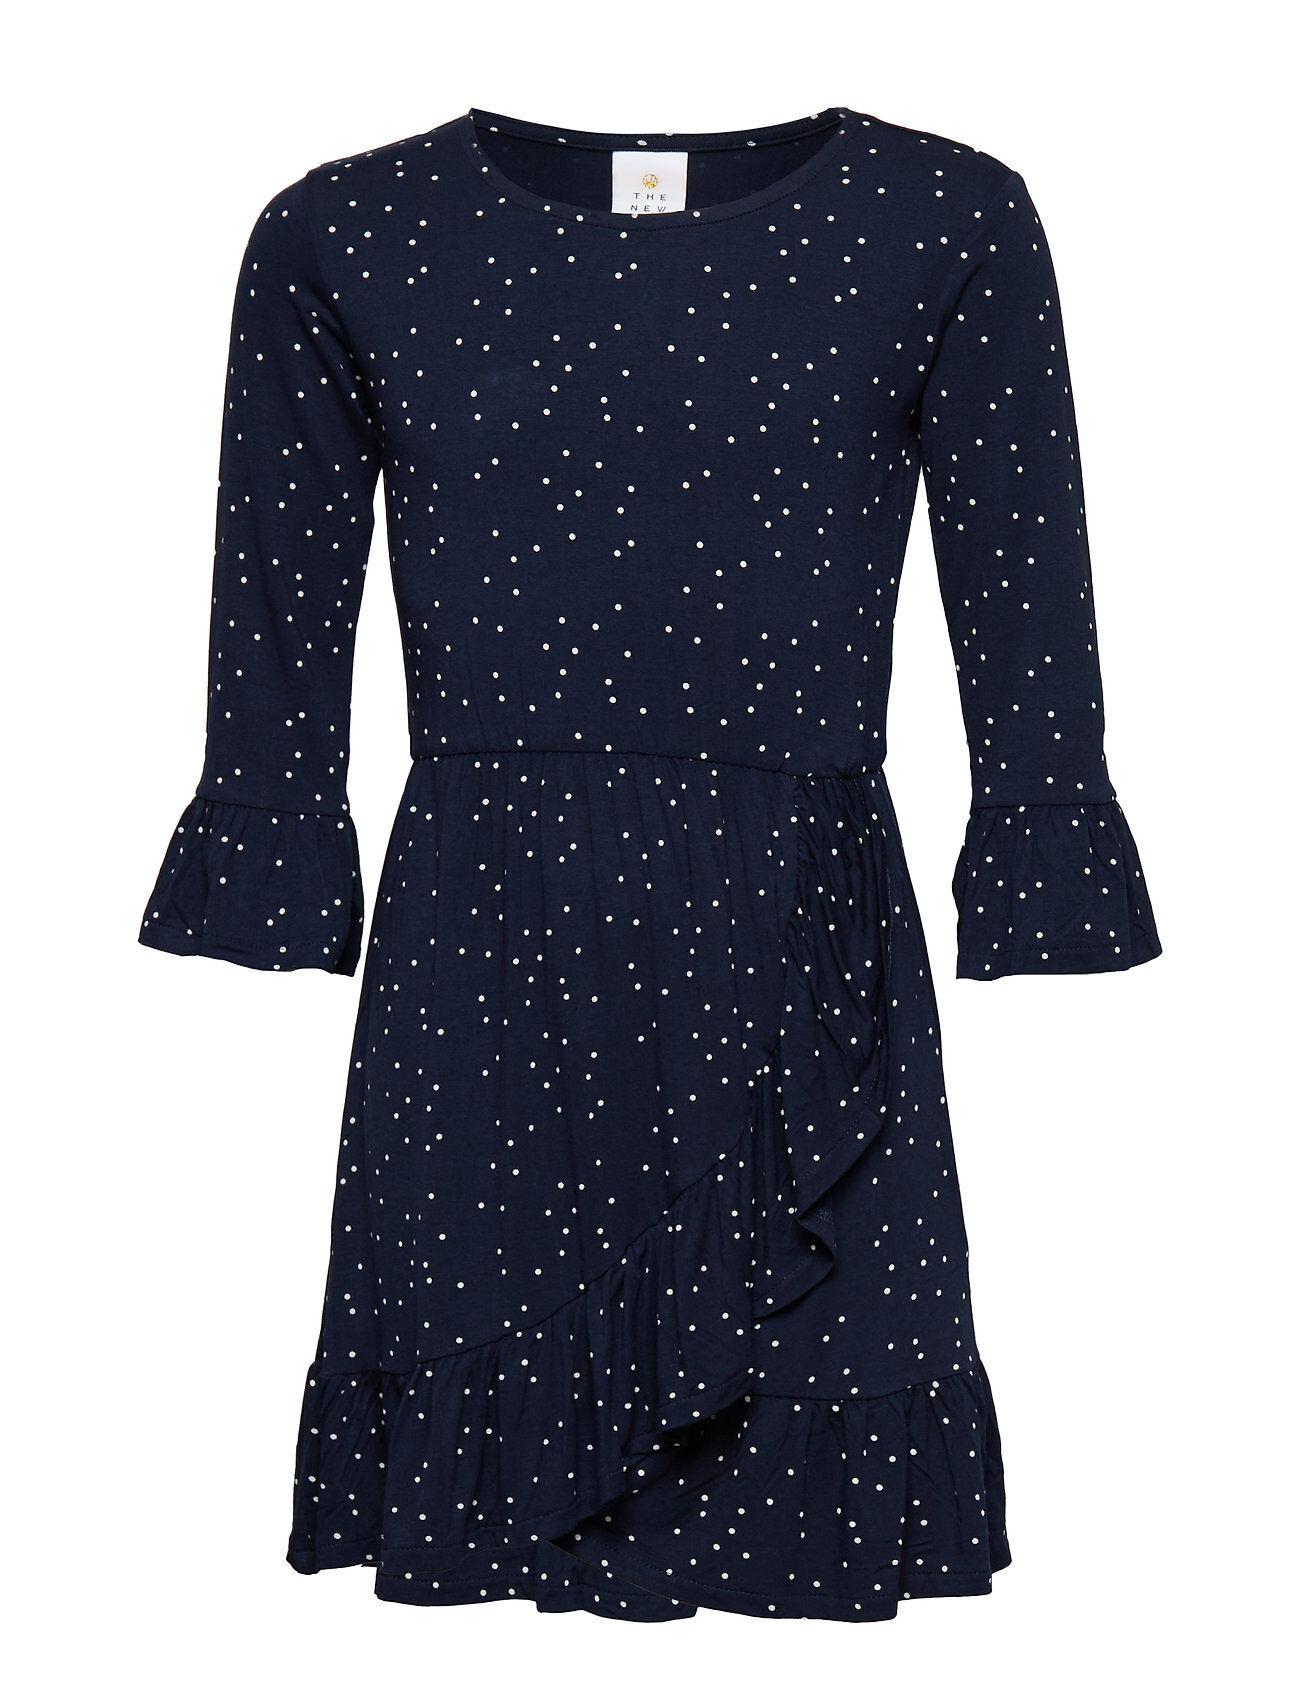 The New Kisa Frill Dress